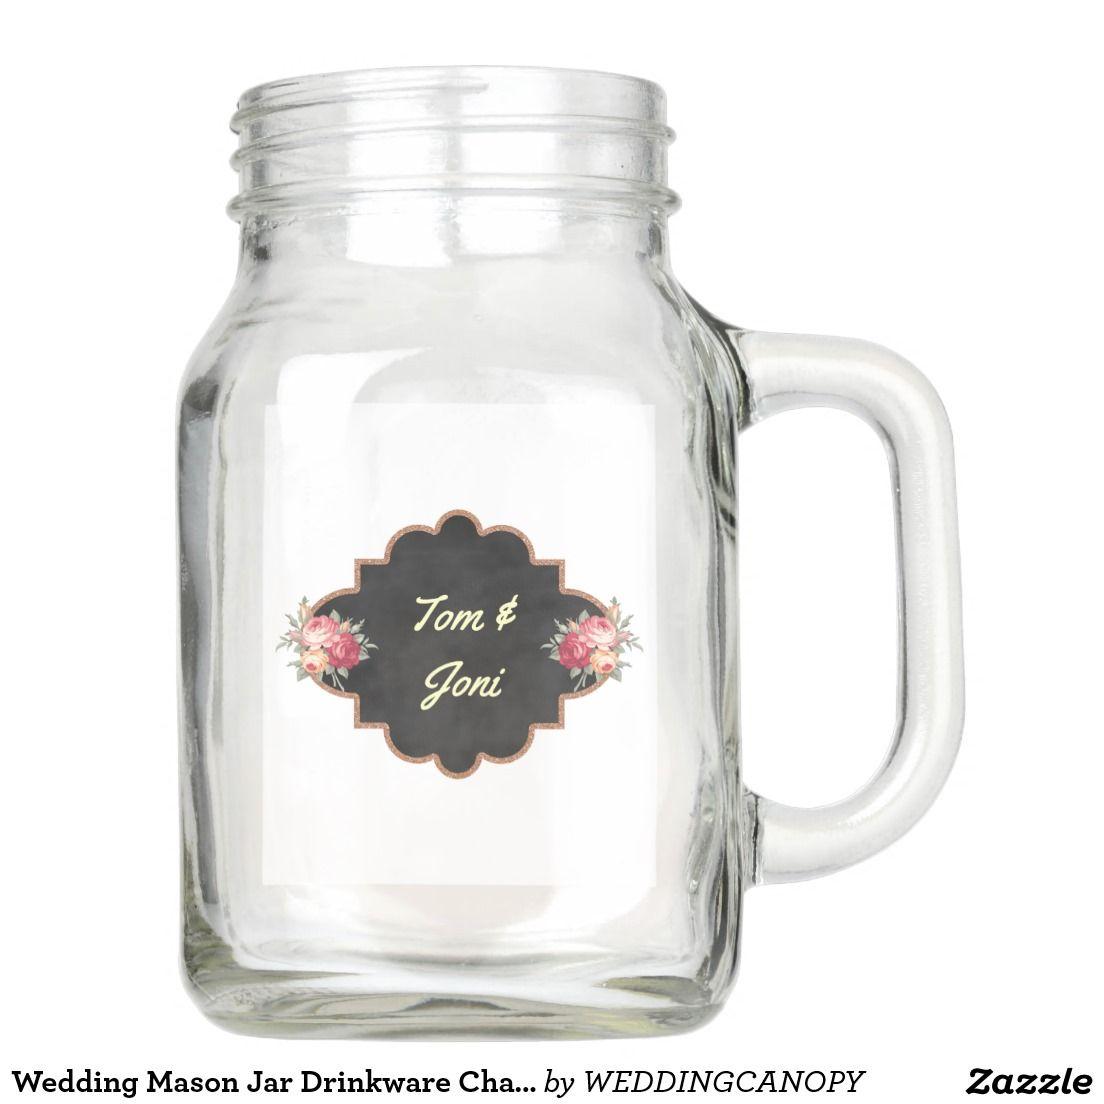 Wedding Mason Jar Drinkware Chalkboard Floral | Chalkboards, Jar and ...